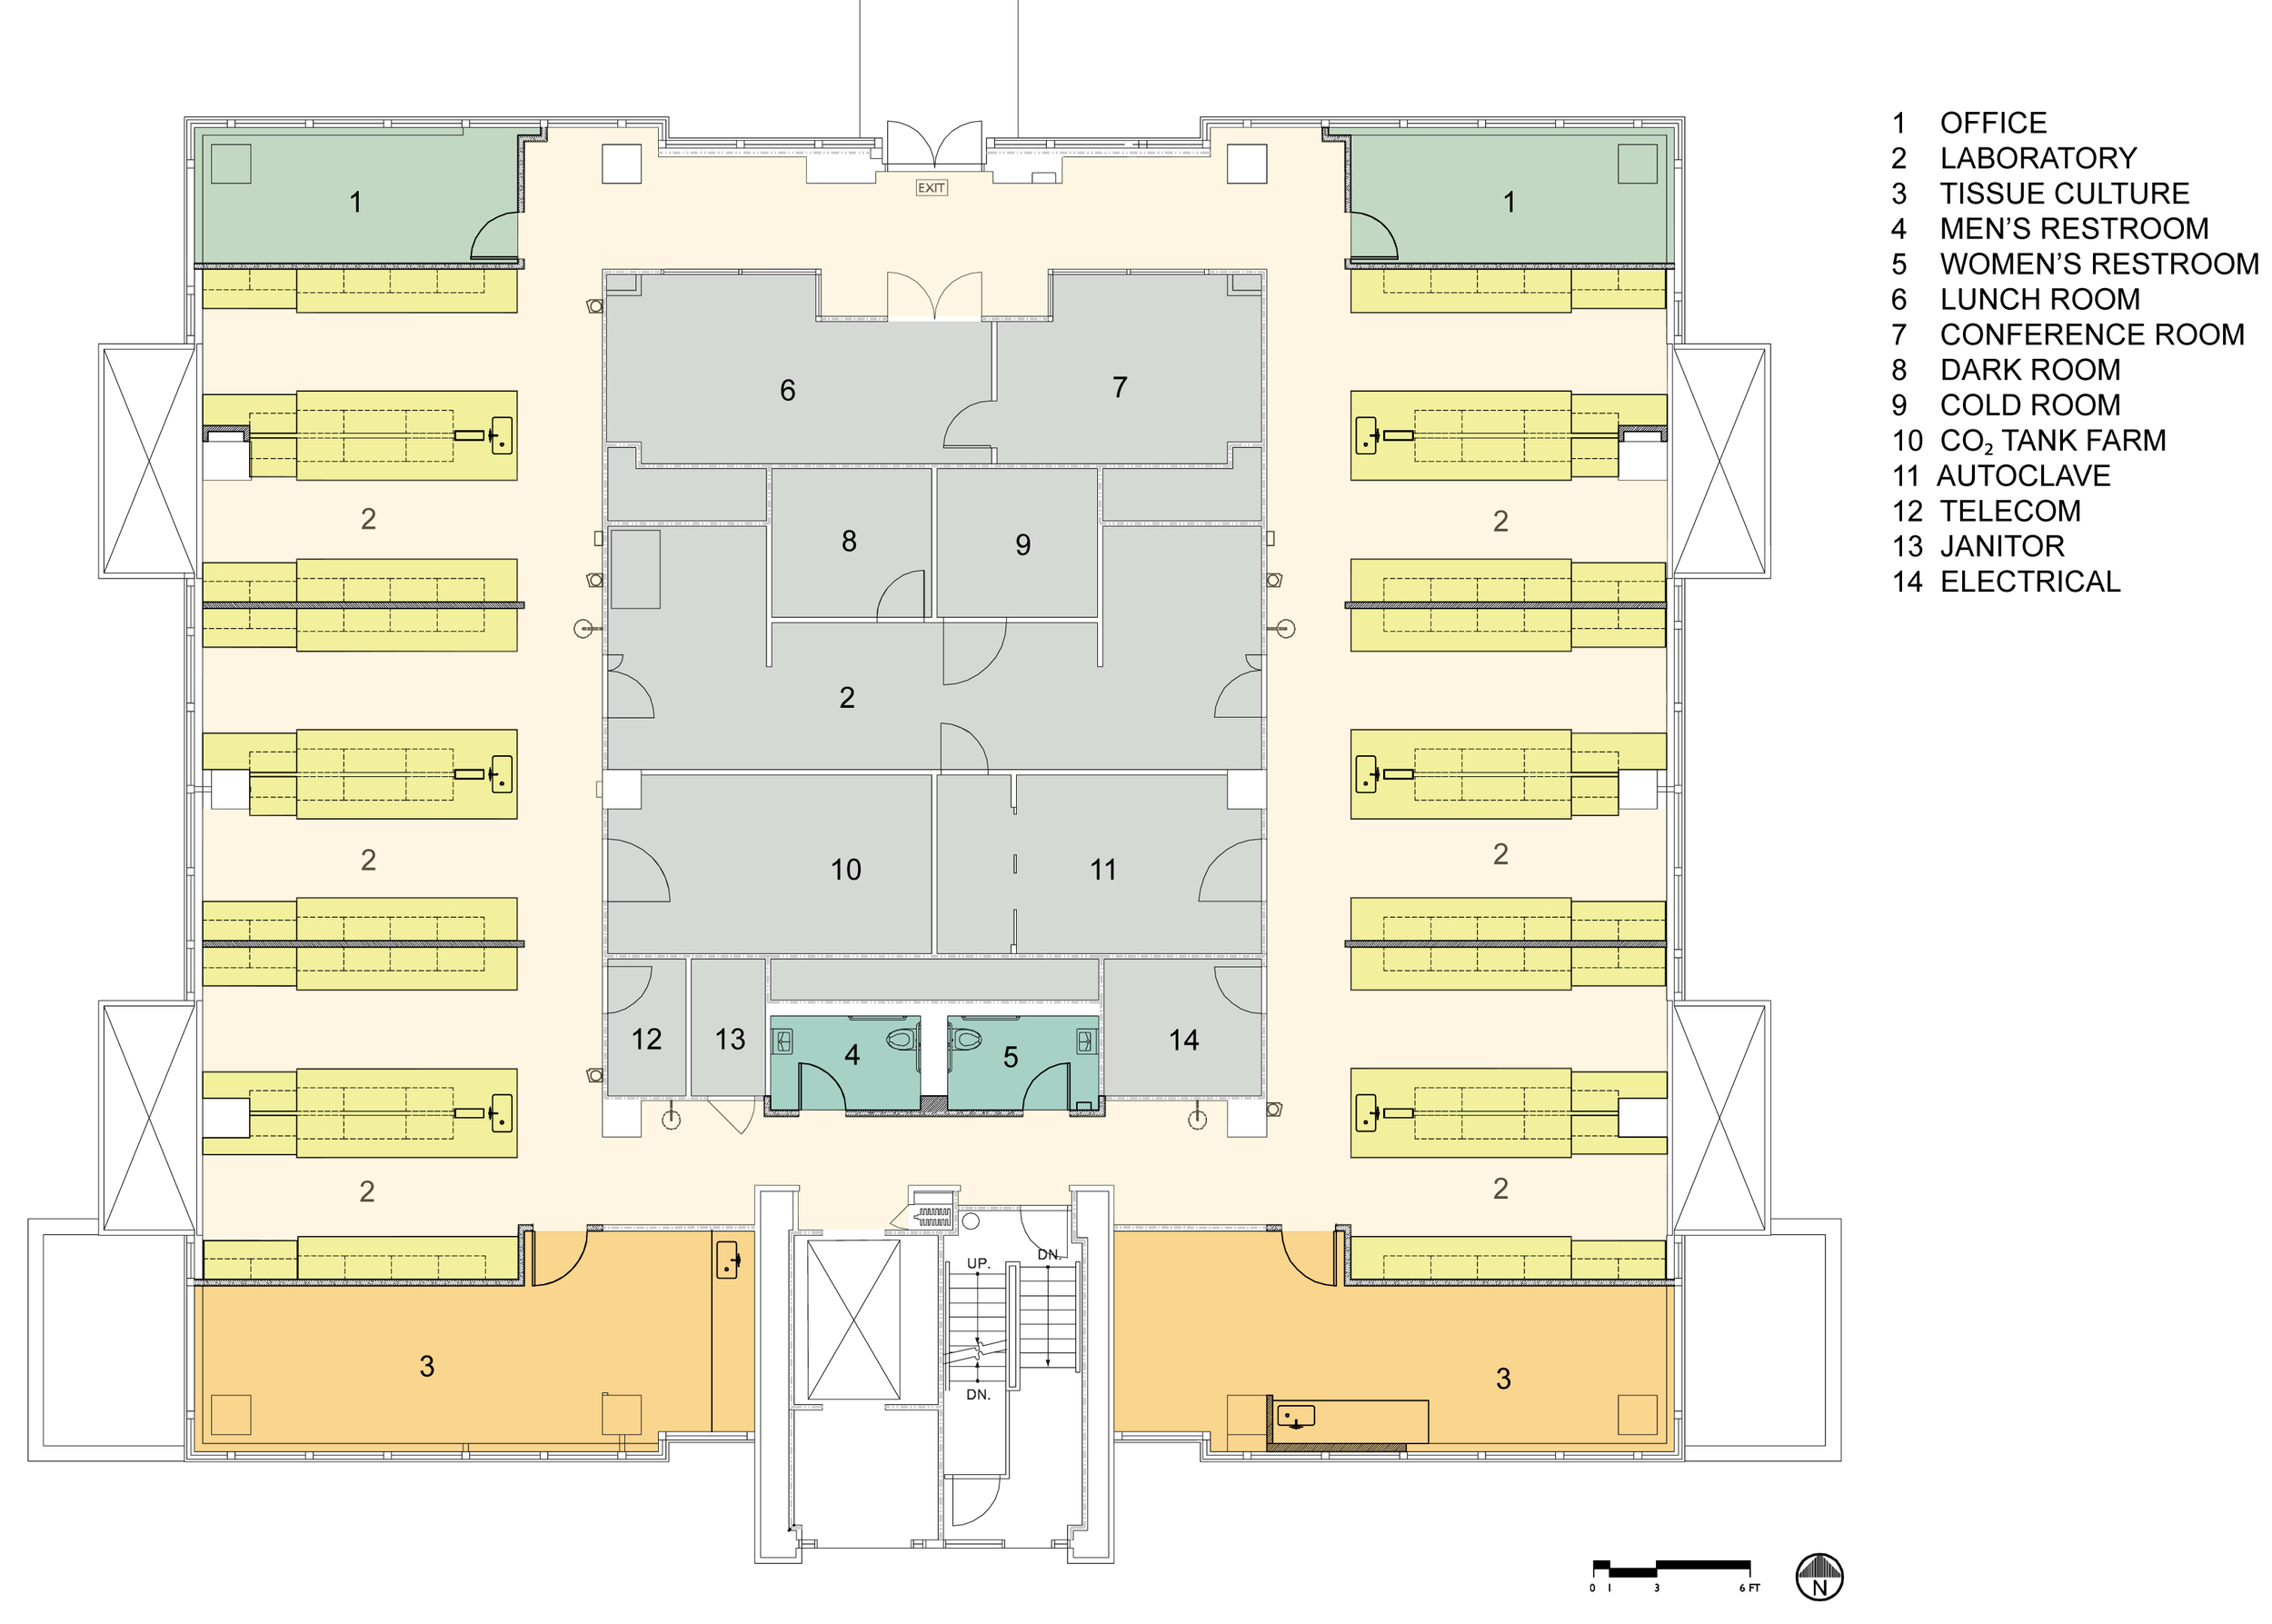 Final-First Floor Plan- Entire Floor_no grid 8.jpg